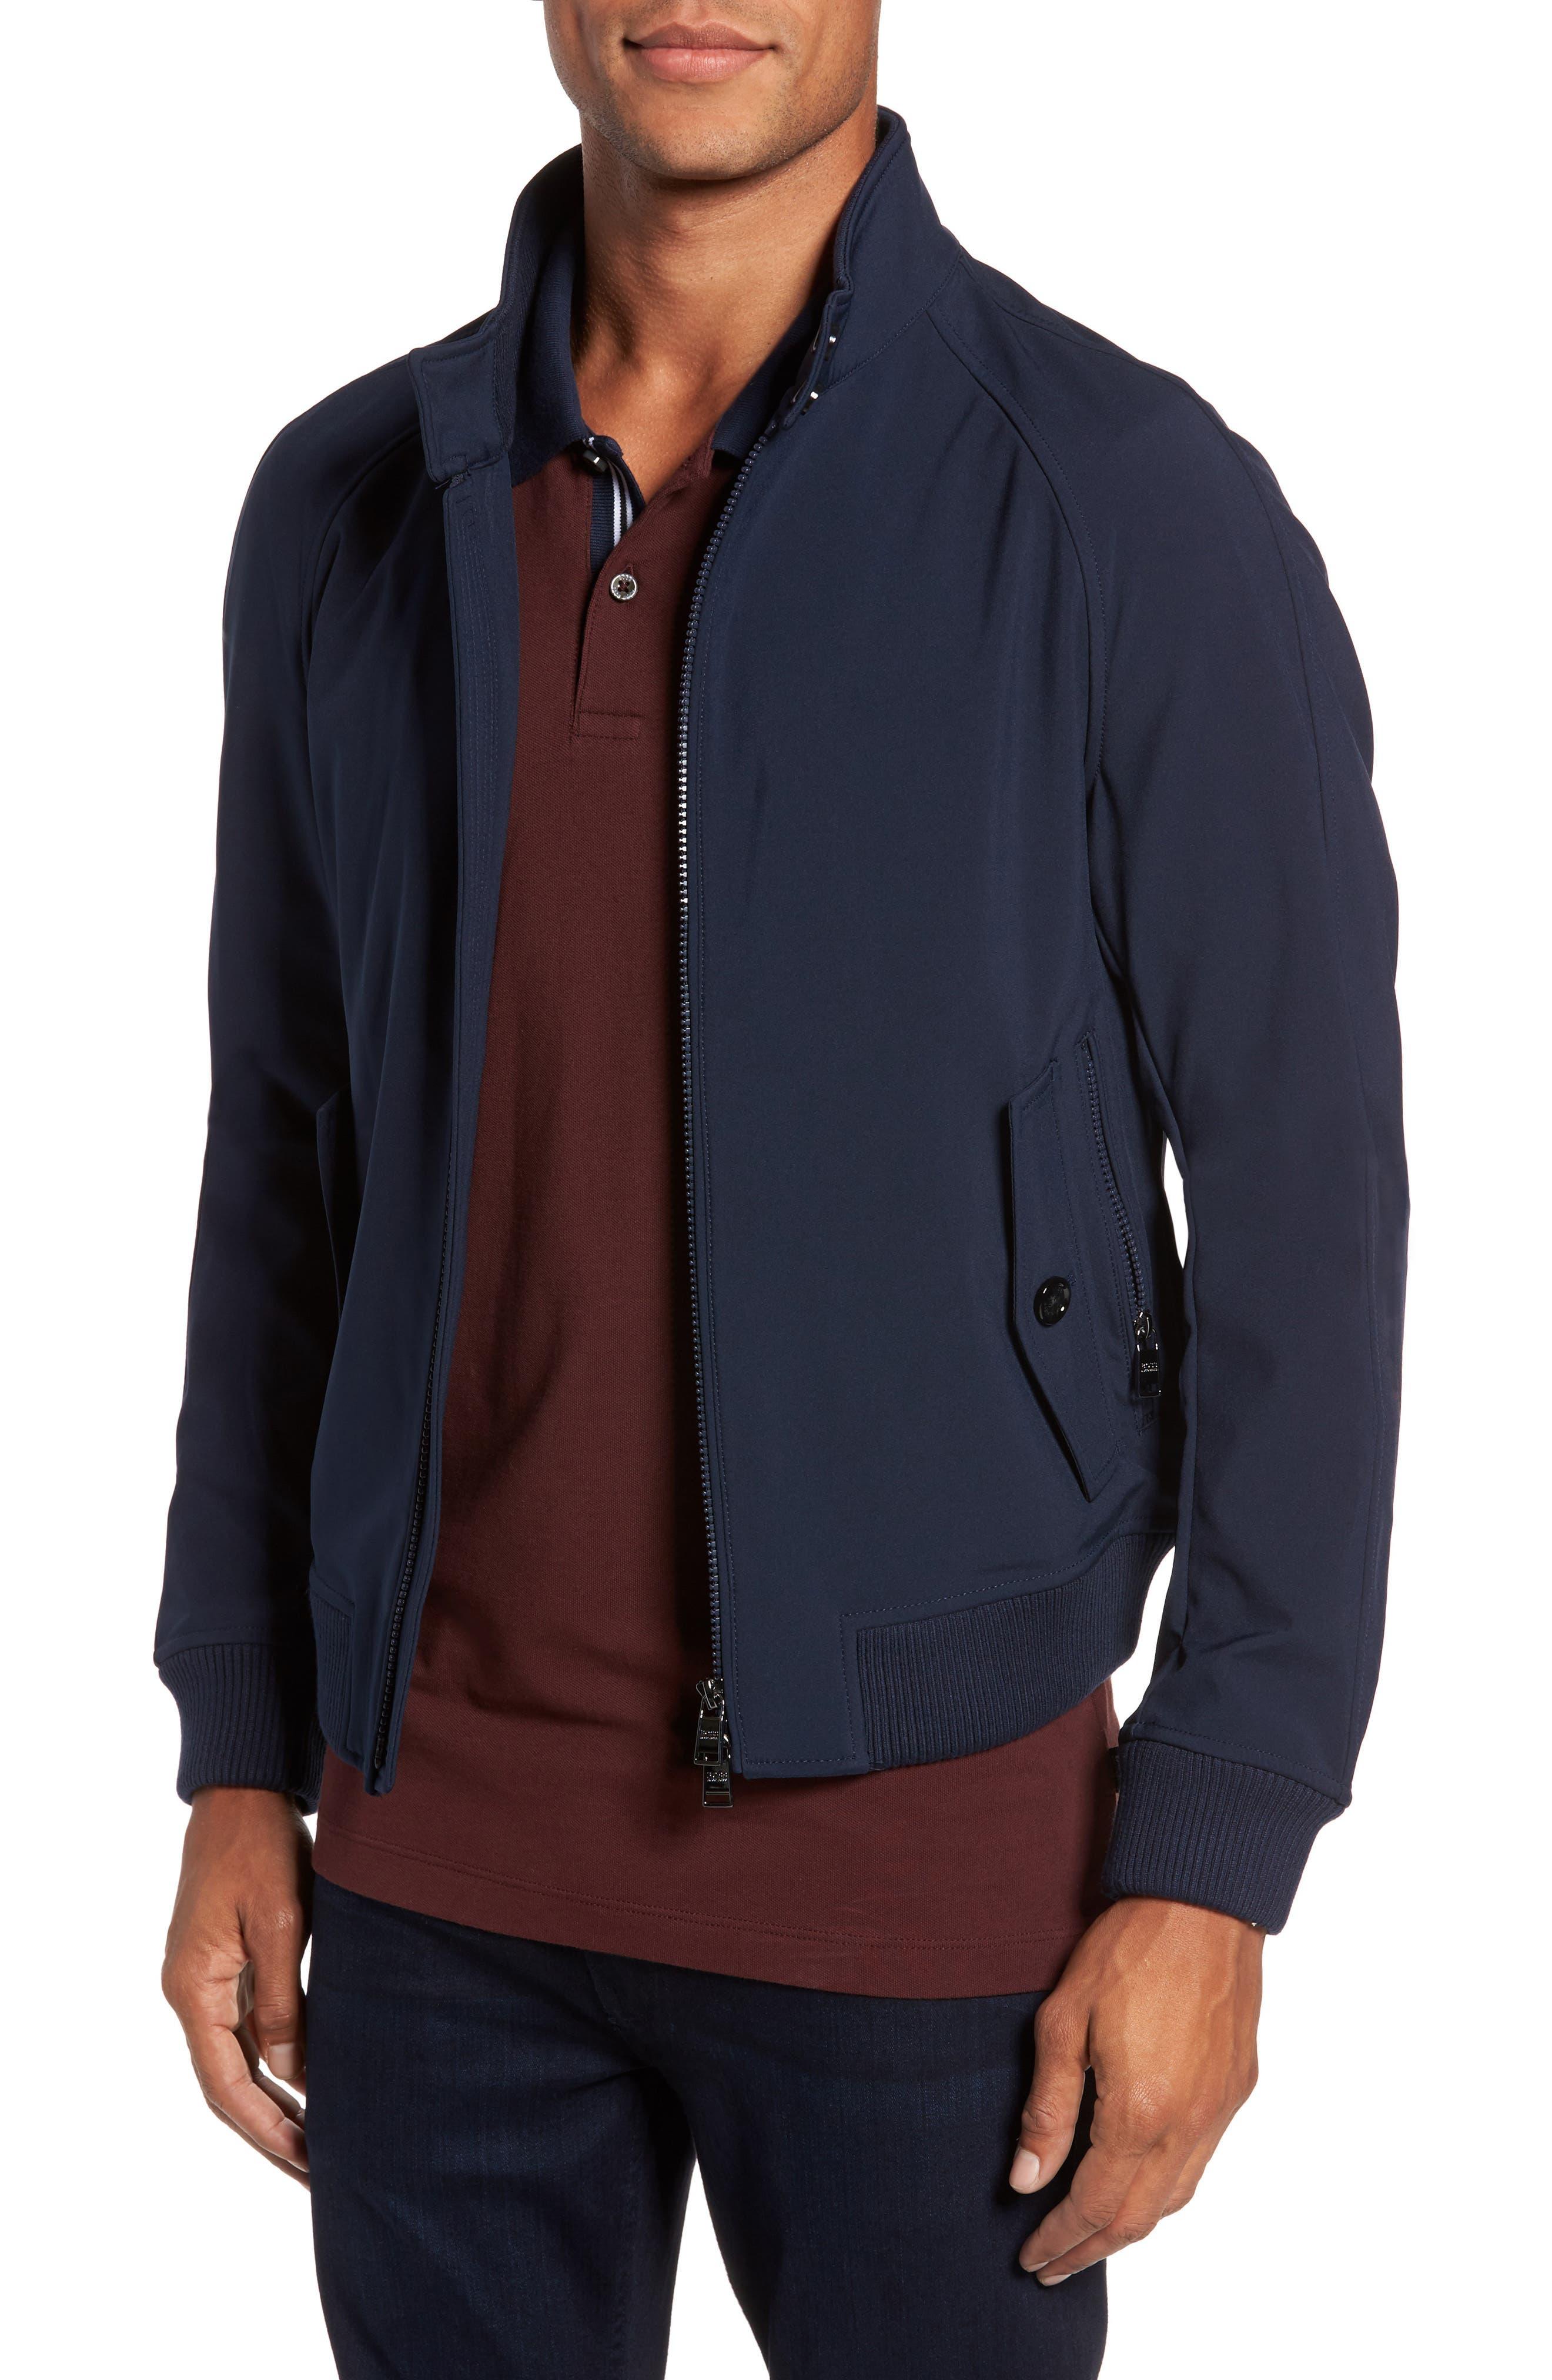 Corva Technical Jacket,                             Main thumbnail 1, color,                             410